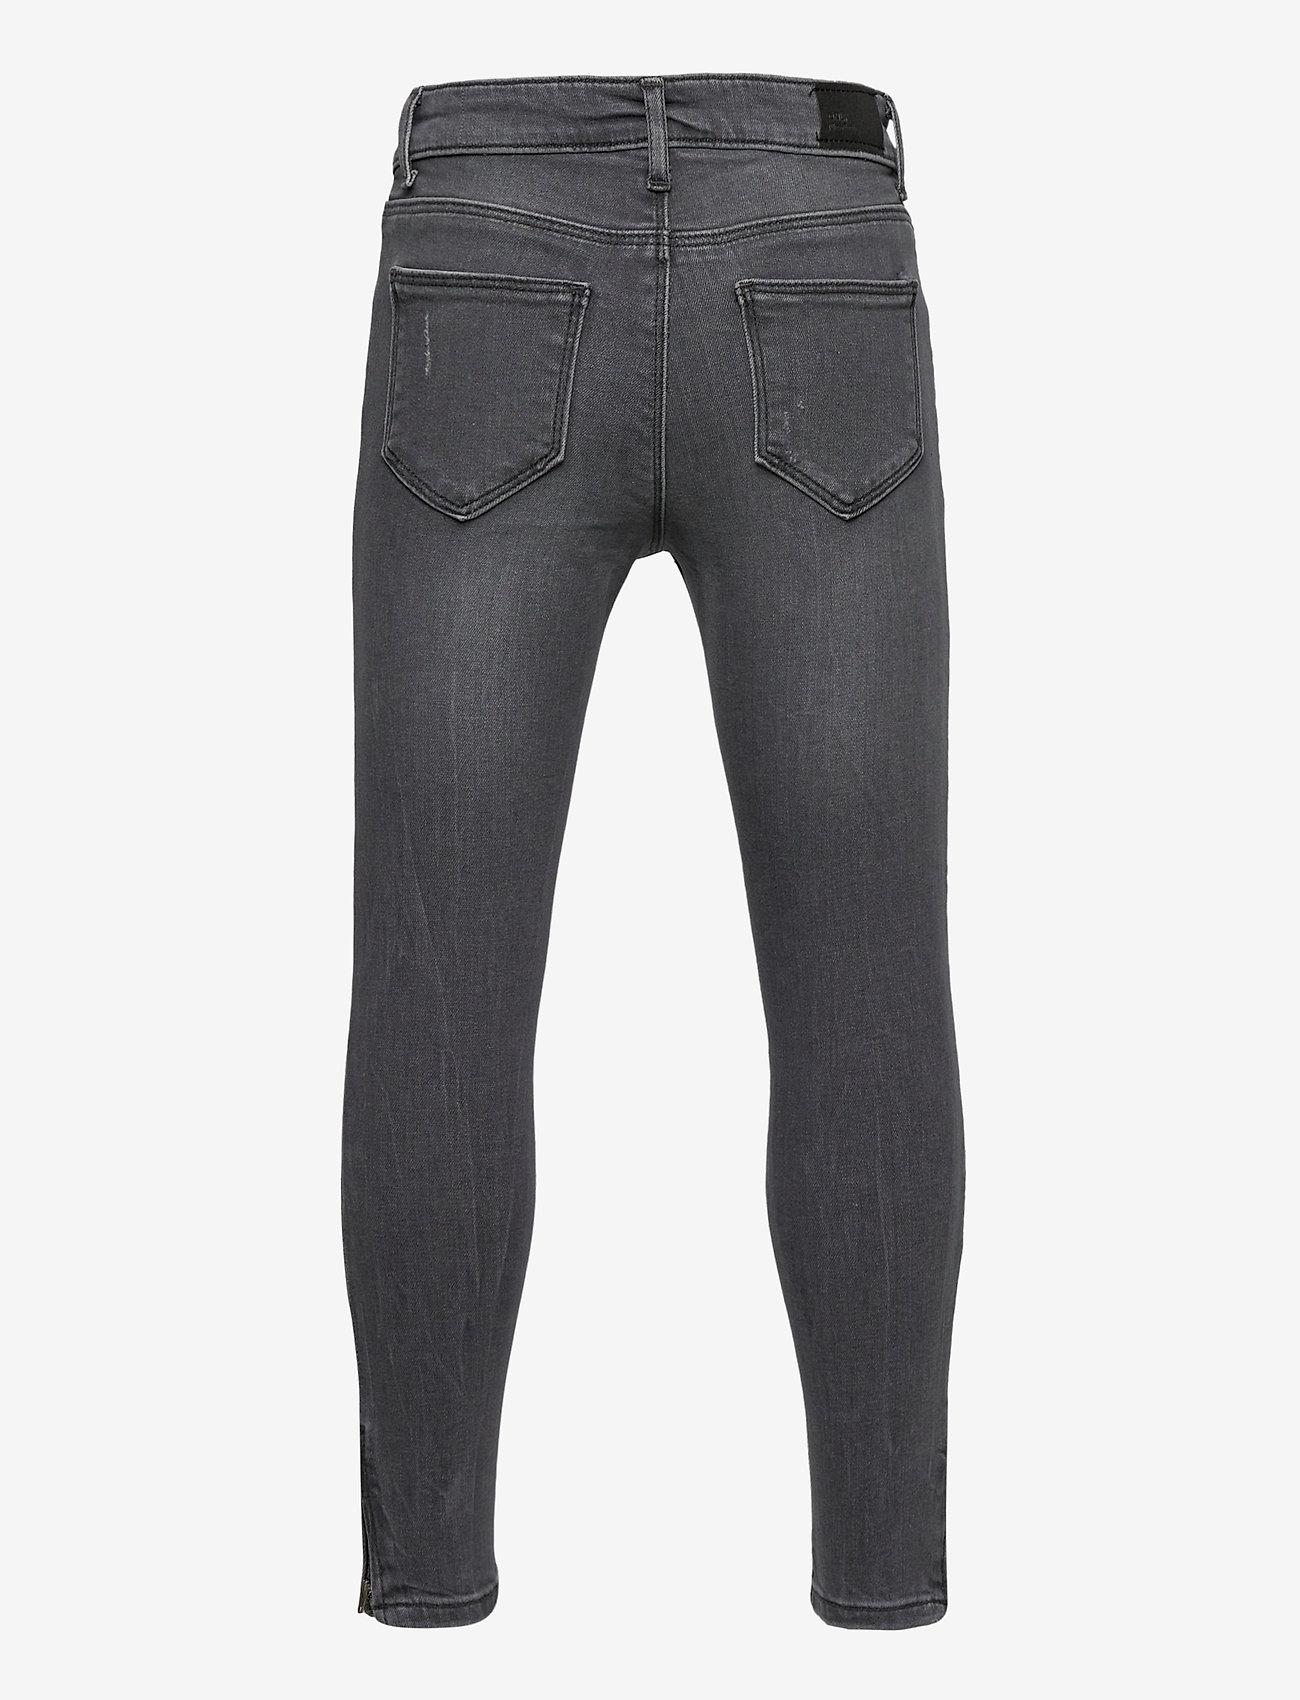 Kids Only - KONKENDEL GREY ZIP ANK JS CR 192708 NOOS - jeans - grey denim - 1